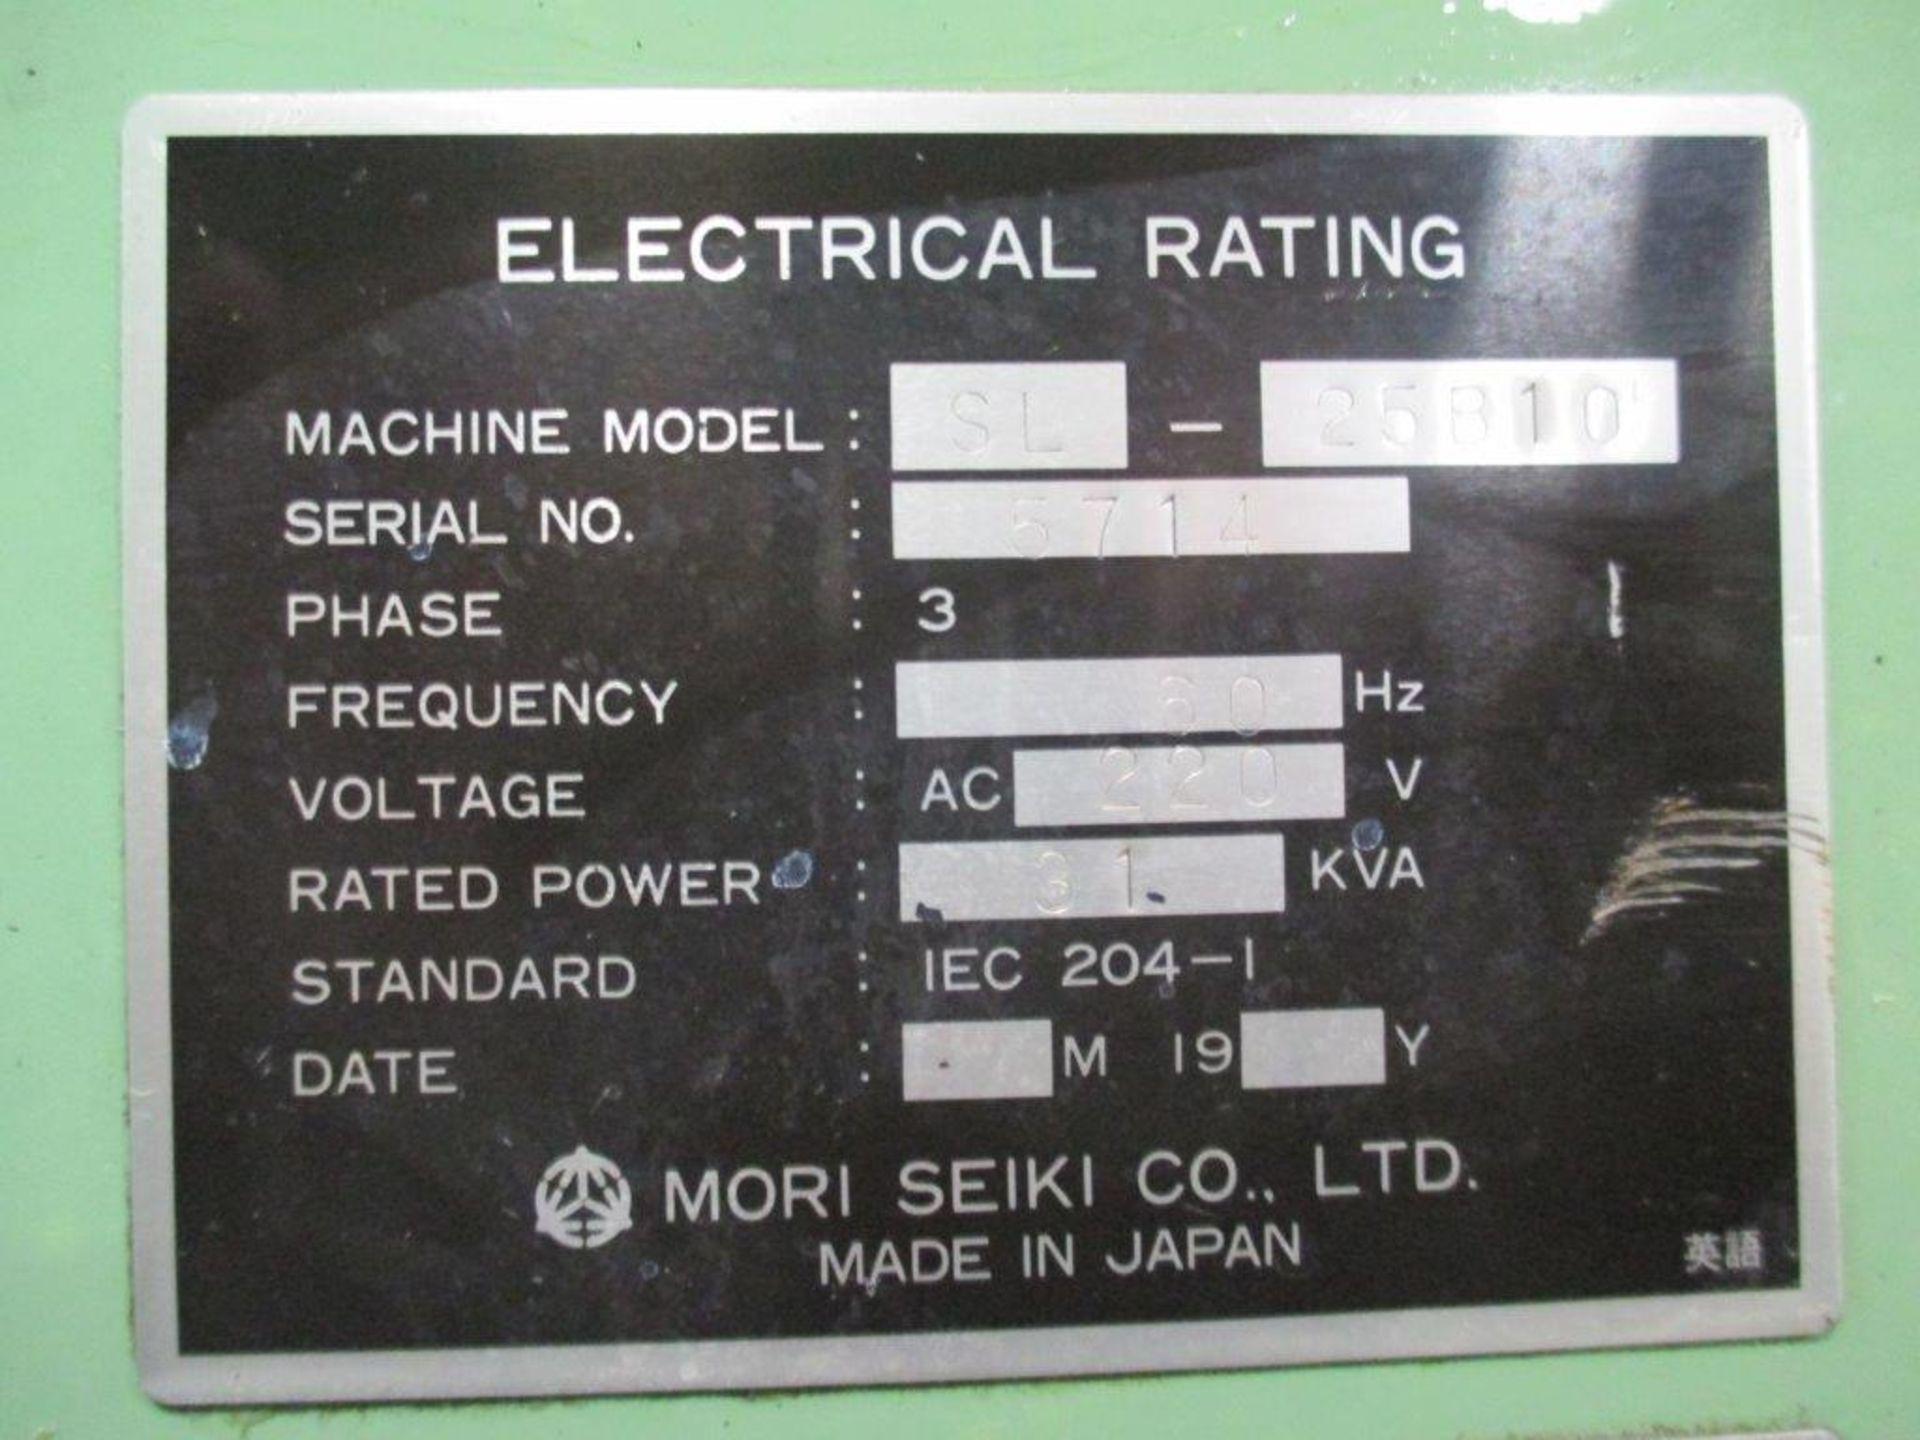 Mori Seiki SL-25B10 CNC Lathe - Image 8 of 8